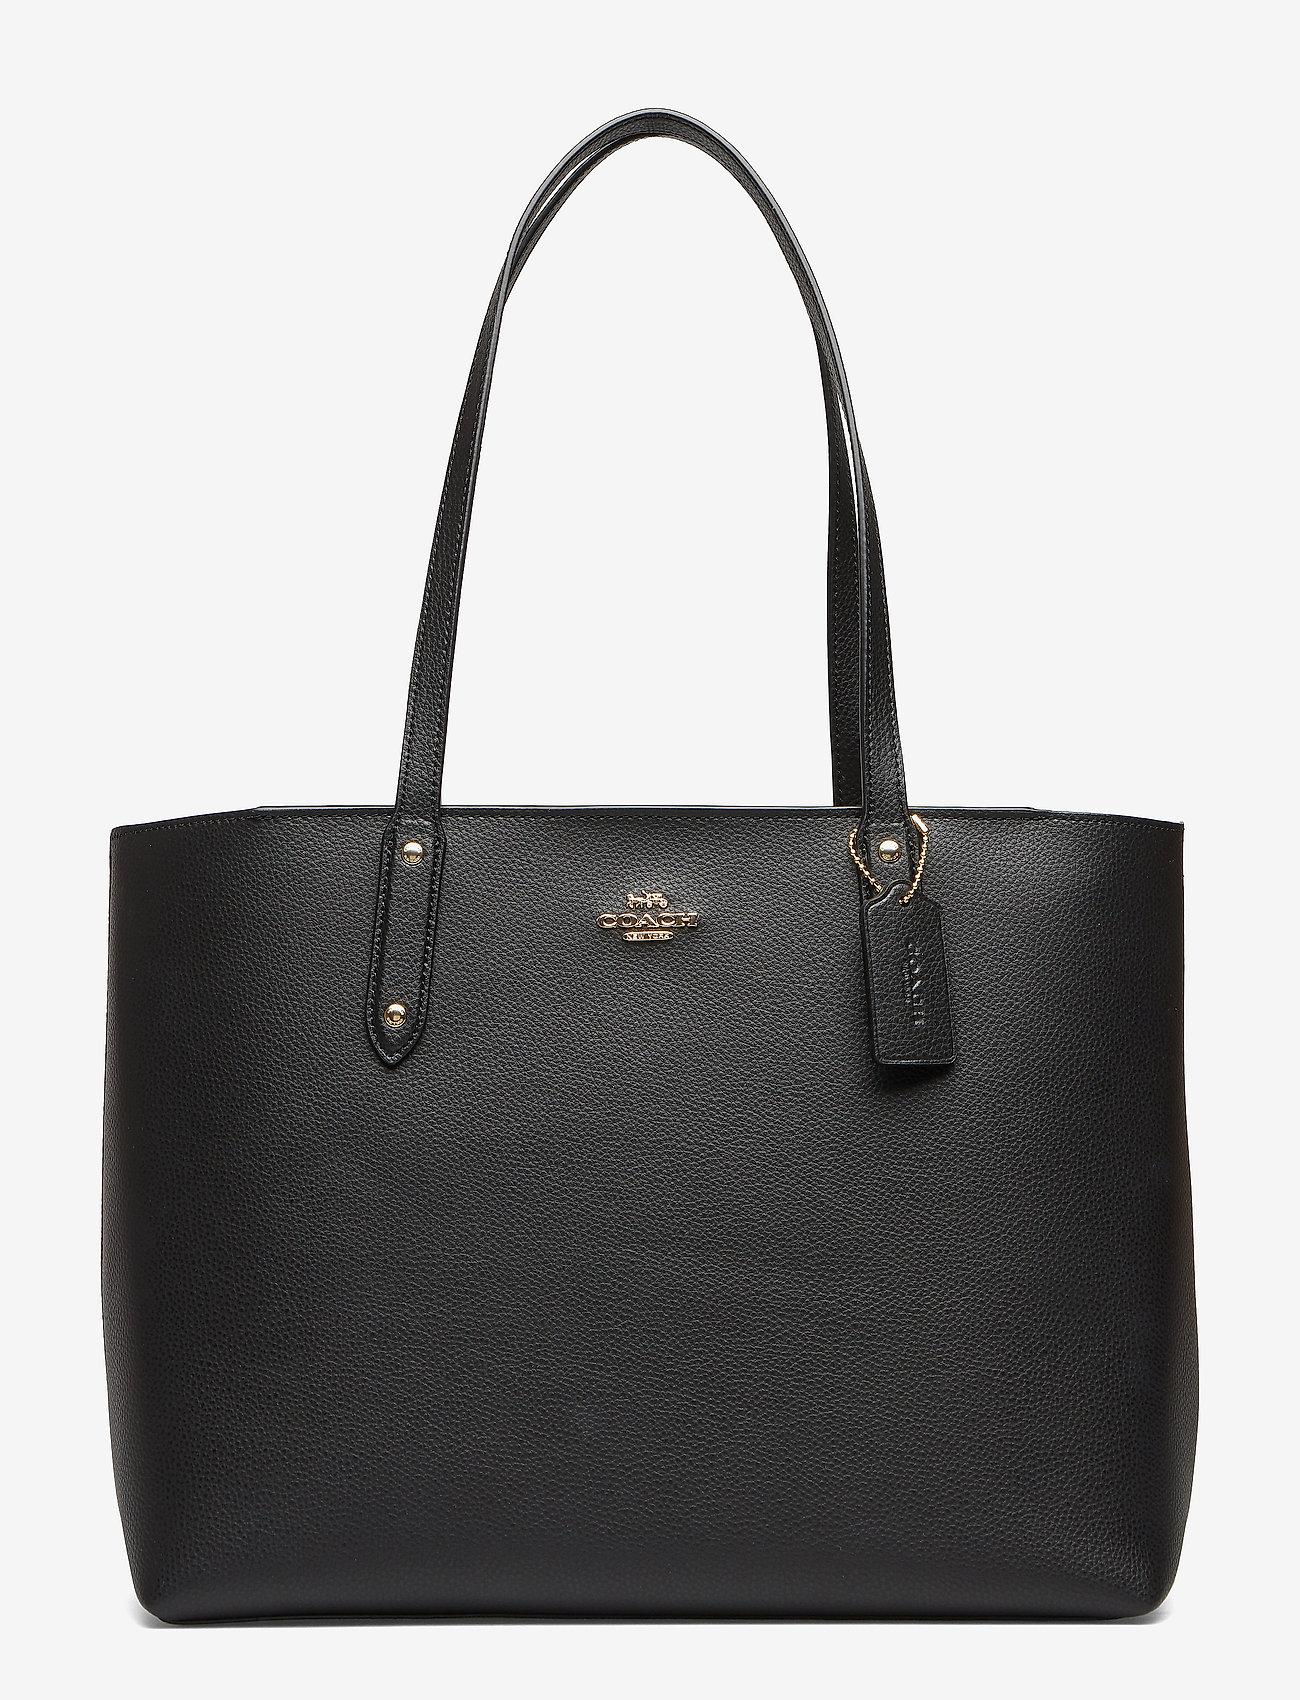 Coach - Womens Bags Totes - fashion shoppers - gd/black